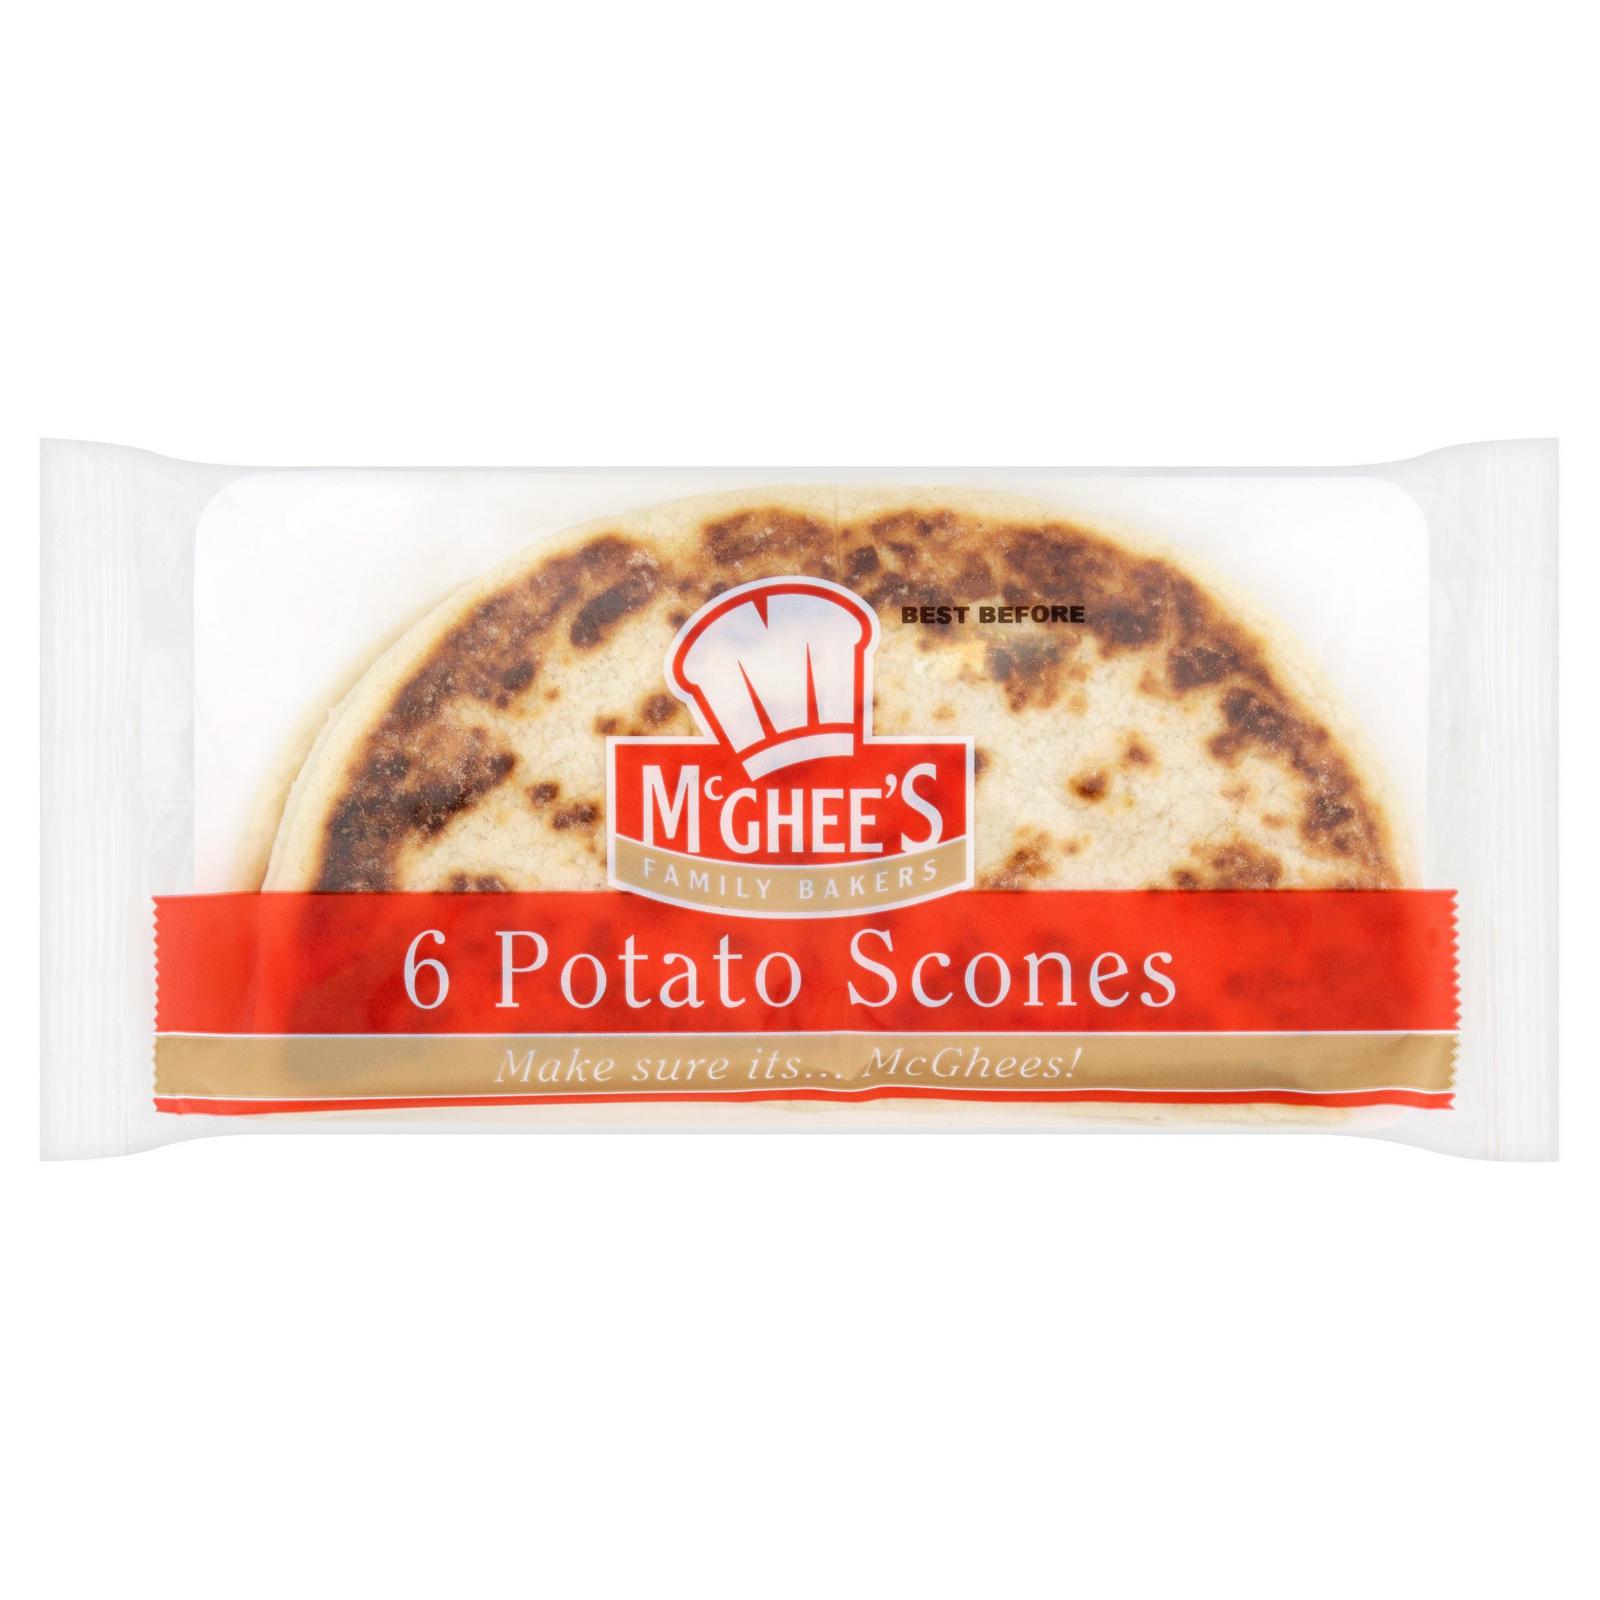 Mcghees Potato Scone